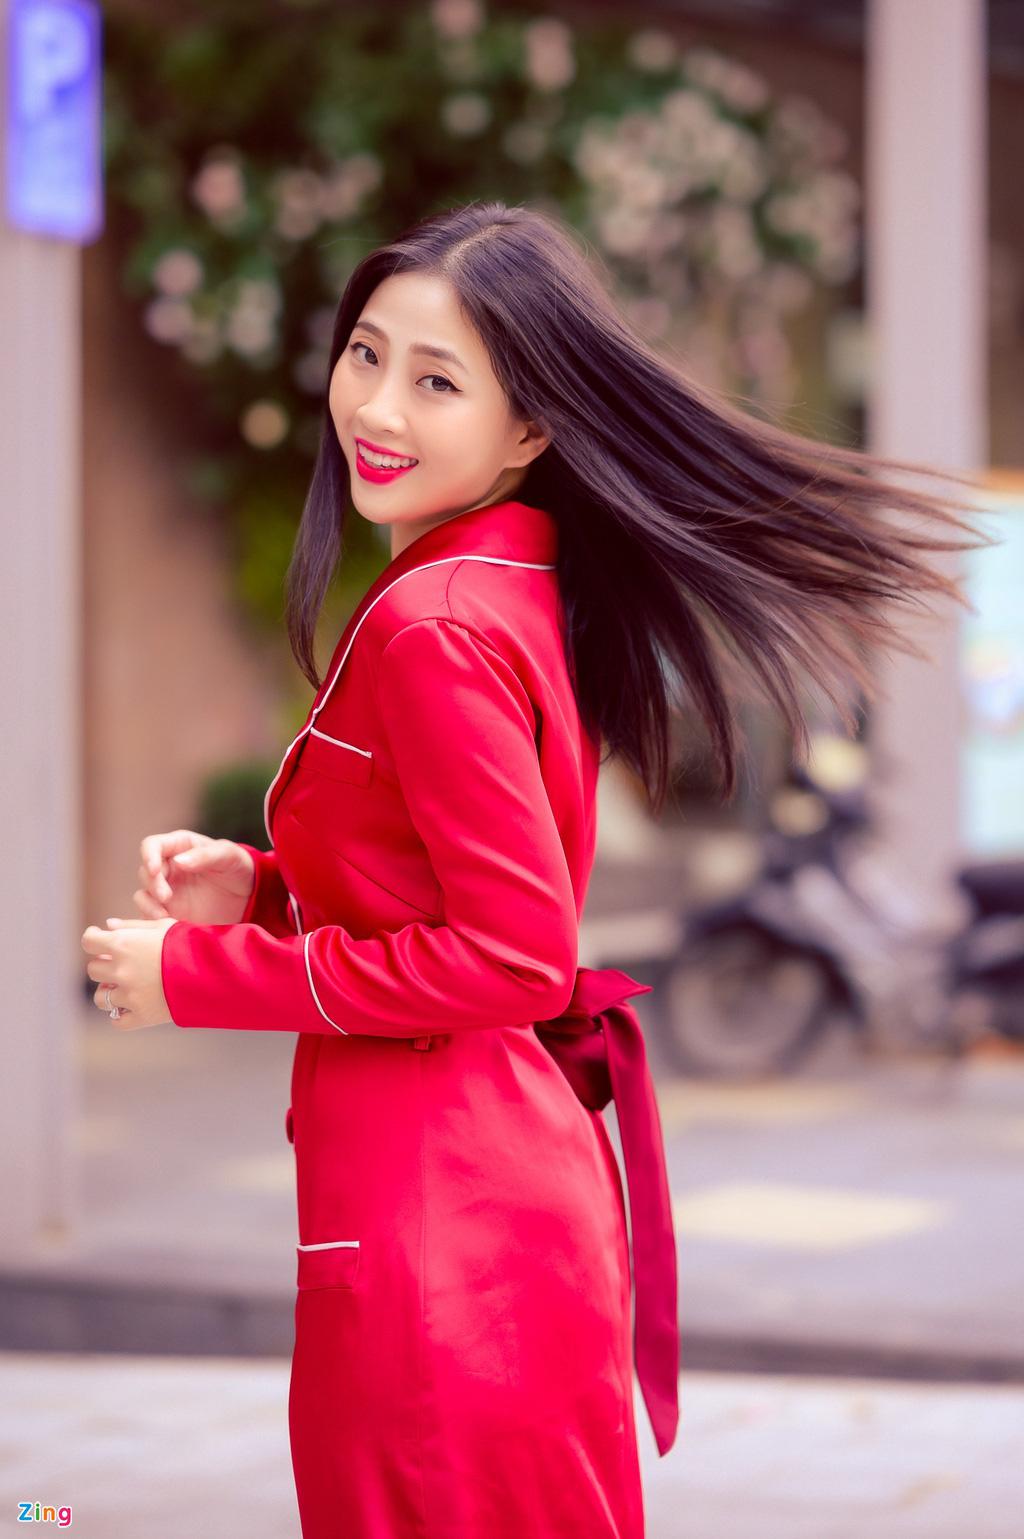 MC Lieu Ha Trinh: 'Toi va ban trai Tay quen nhau qua app hen ho' hinh anh 5 NGUYEN_BA_NGOC_ZING_8945.jpg